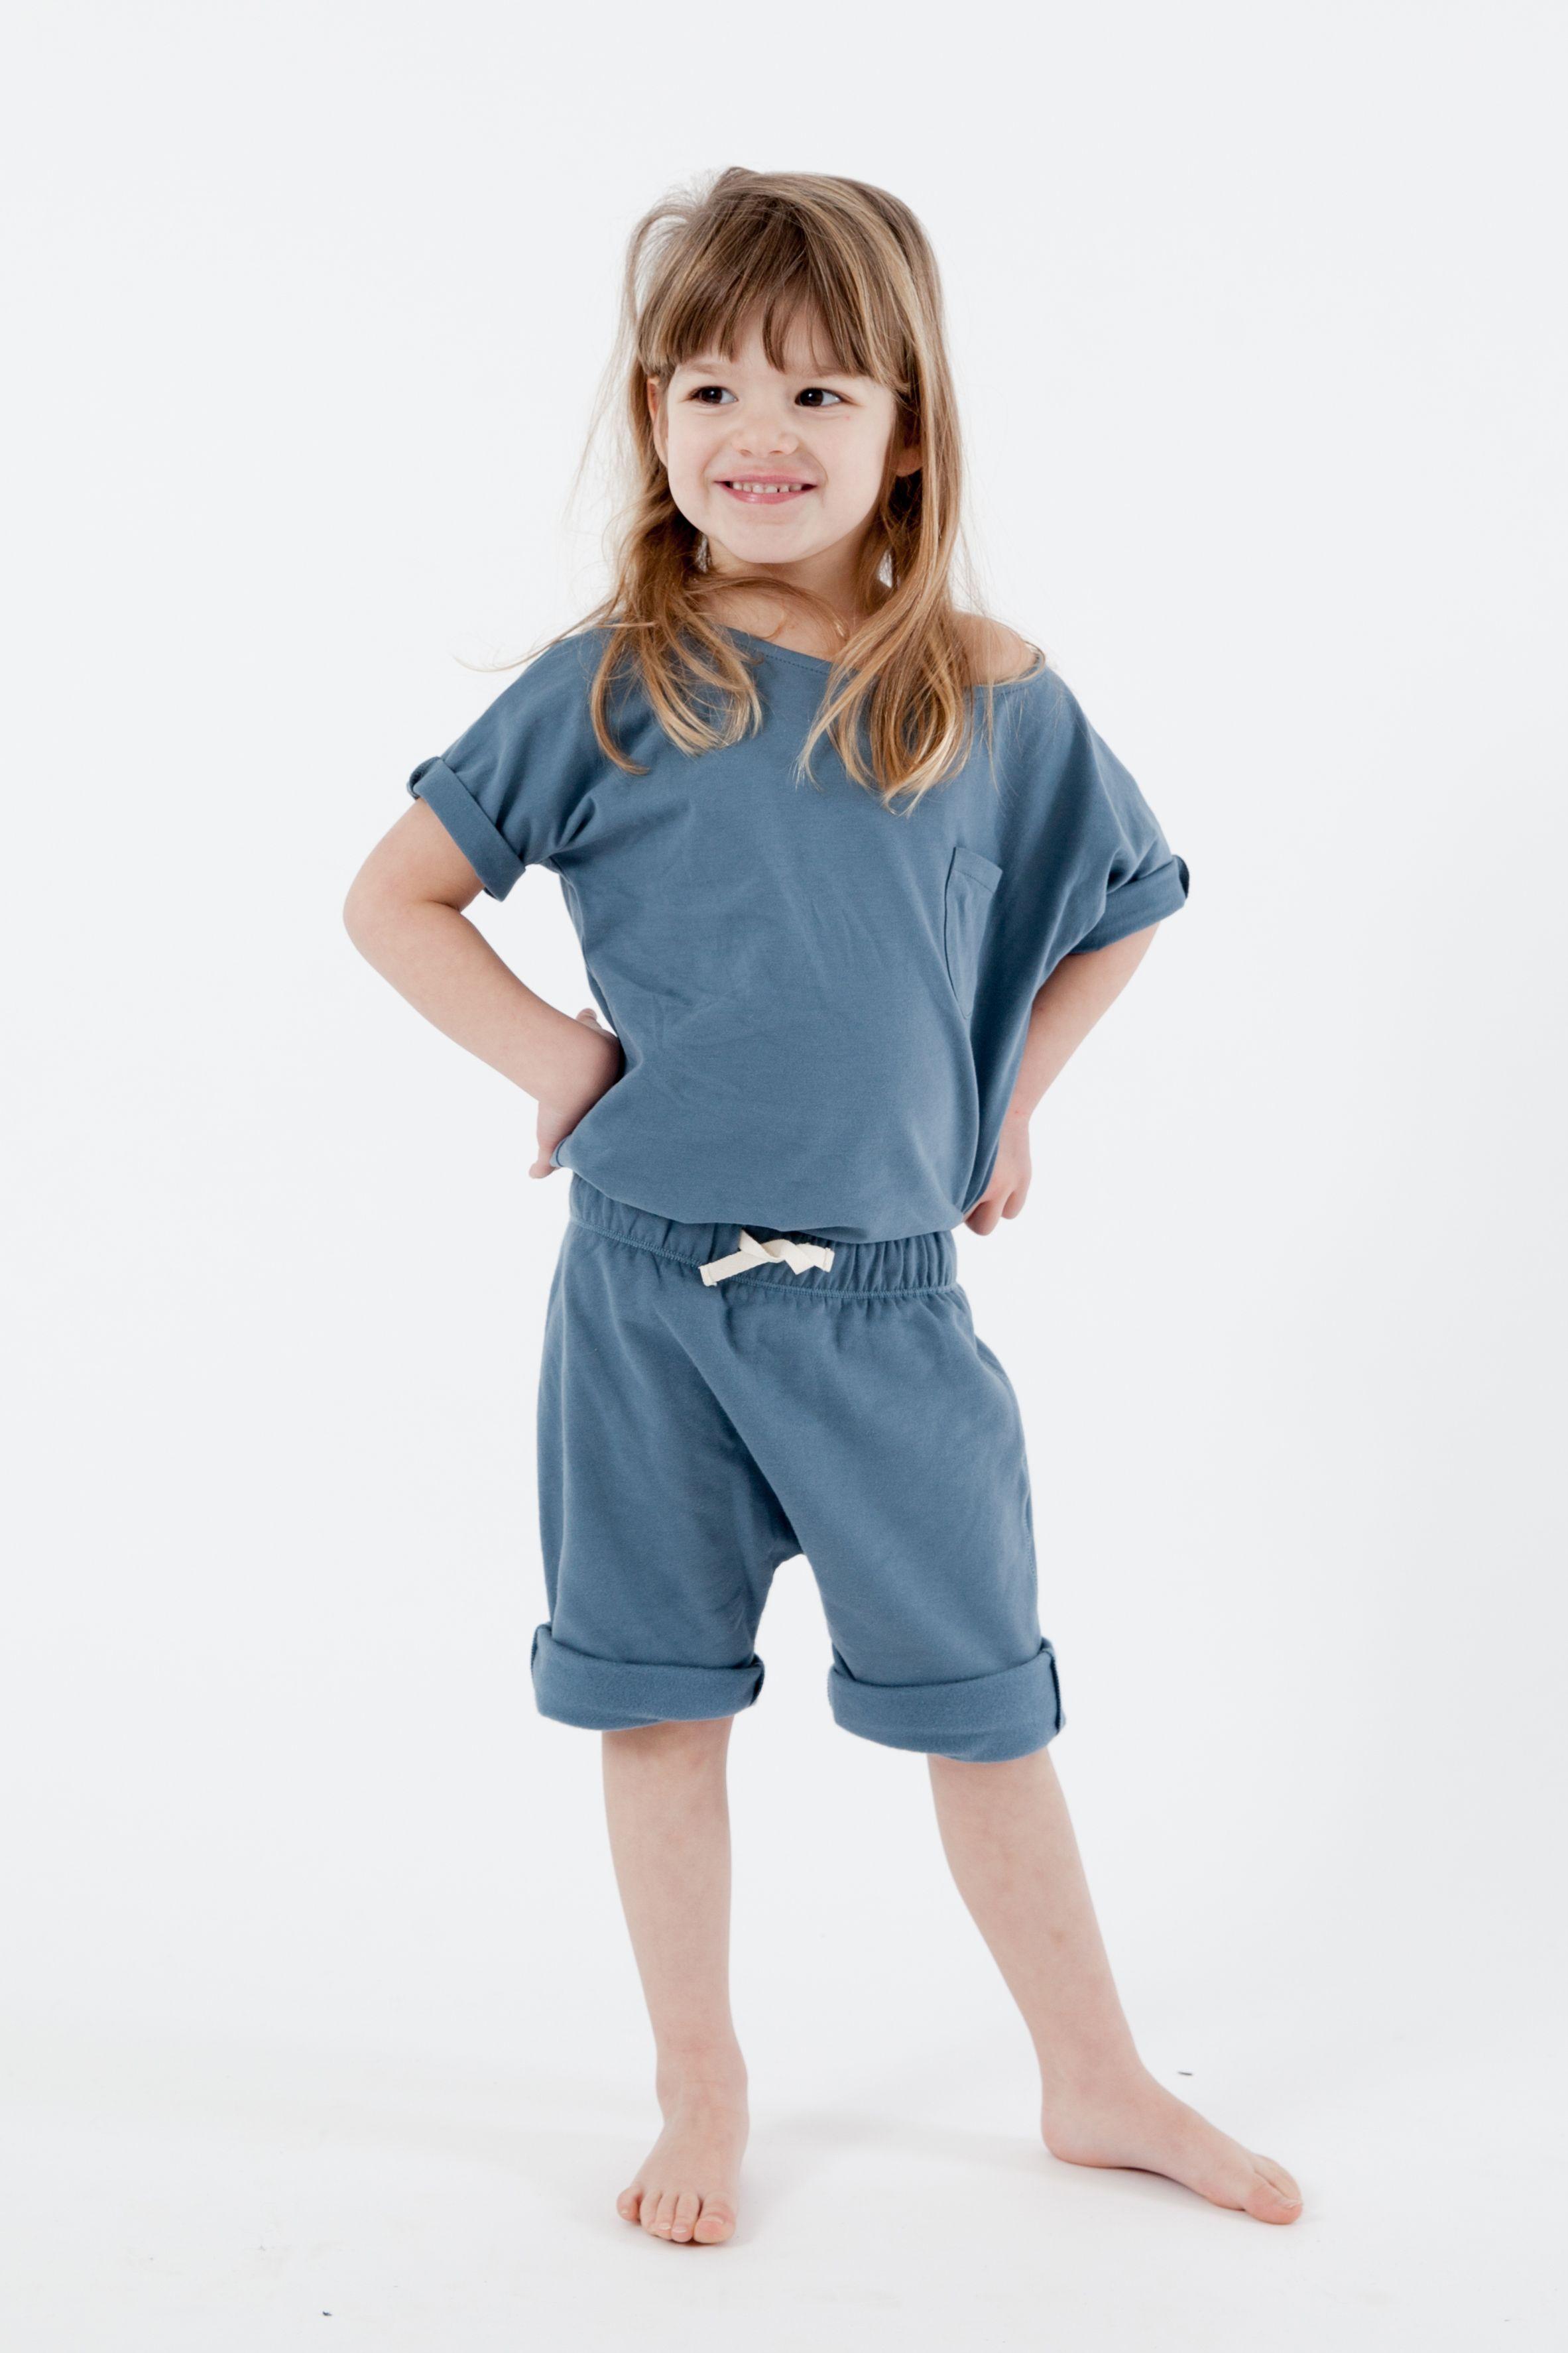 Kinderkleding Webshop.Gray Label Ss15 Summer Tee Shorts Kids Children Kinderen